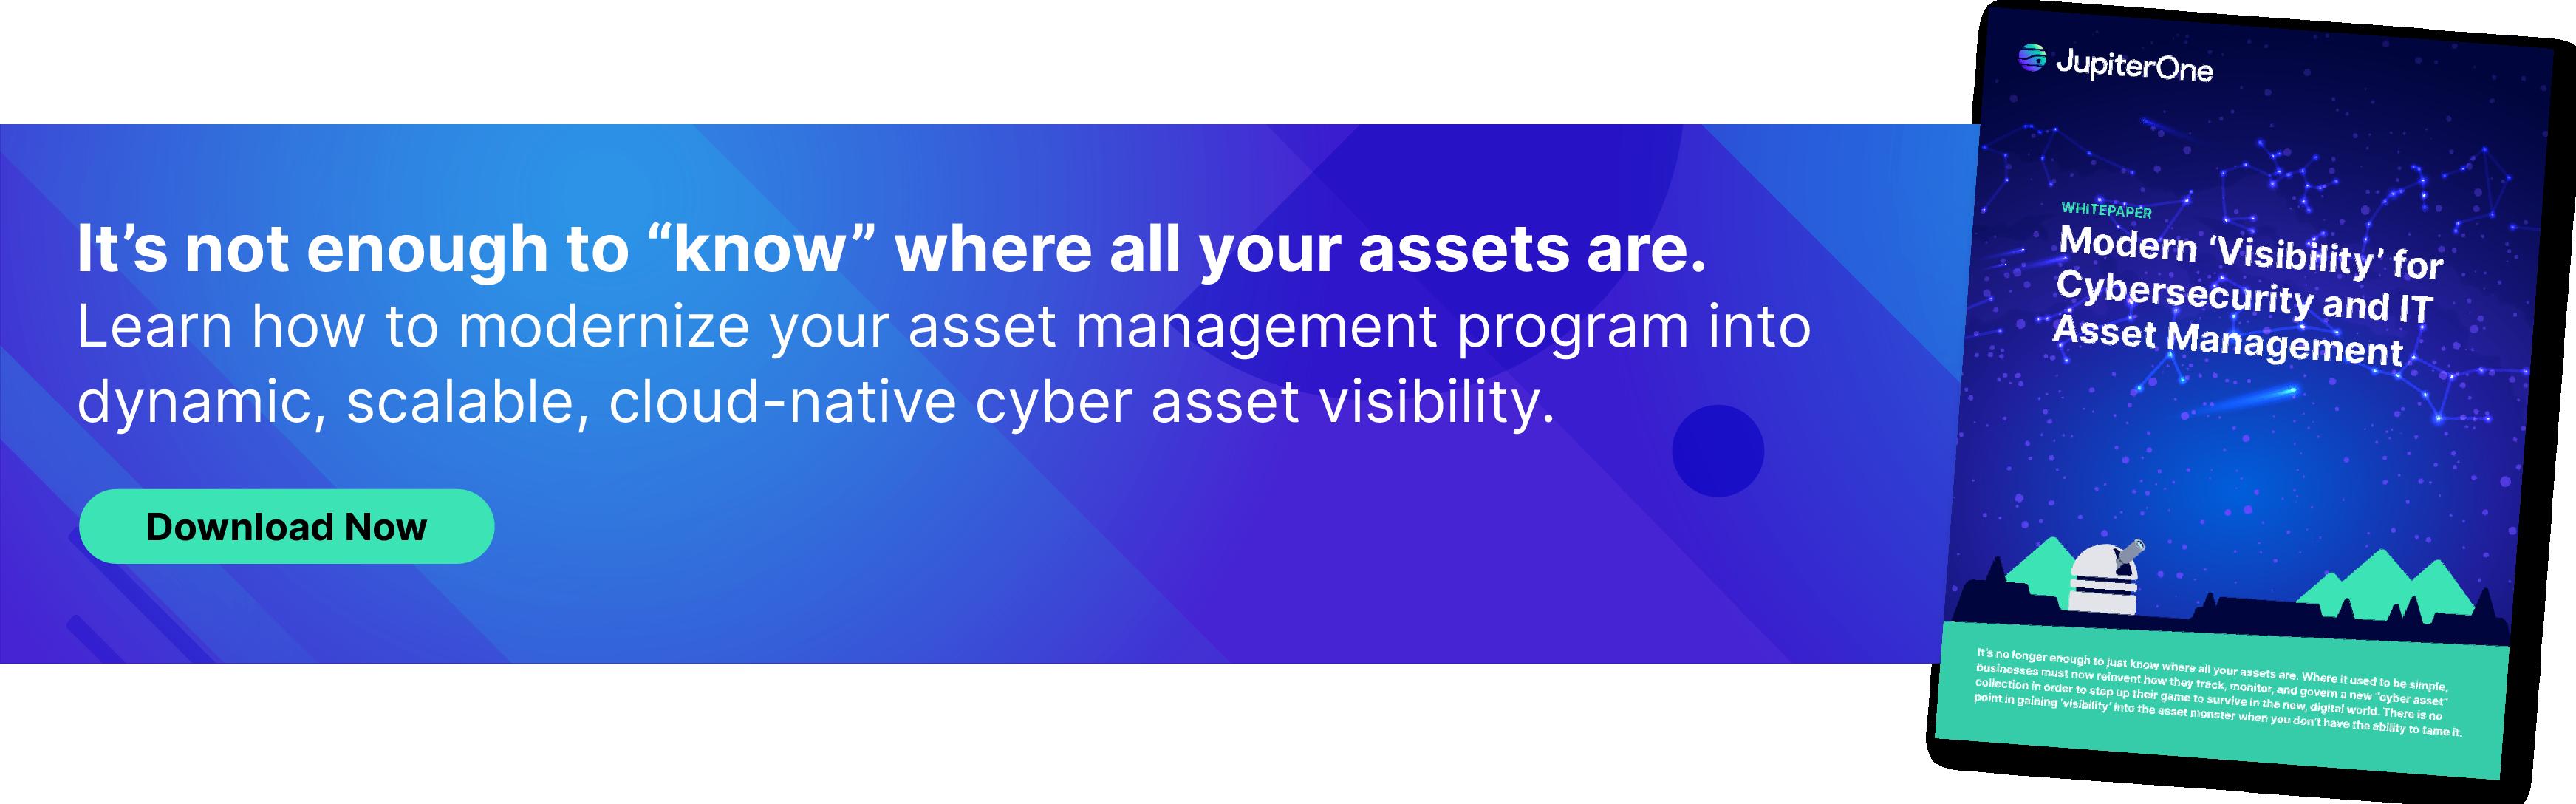 Modern Visibility in Cyberseccurity